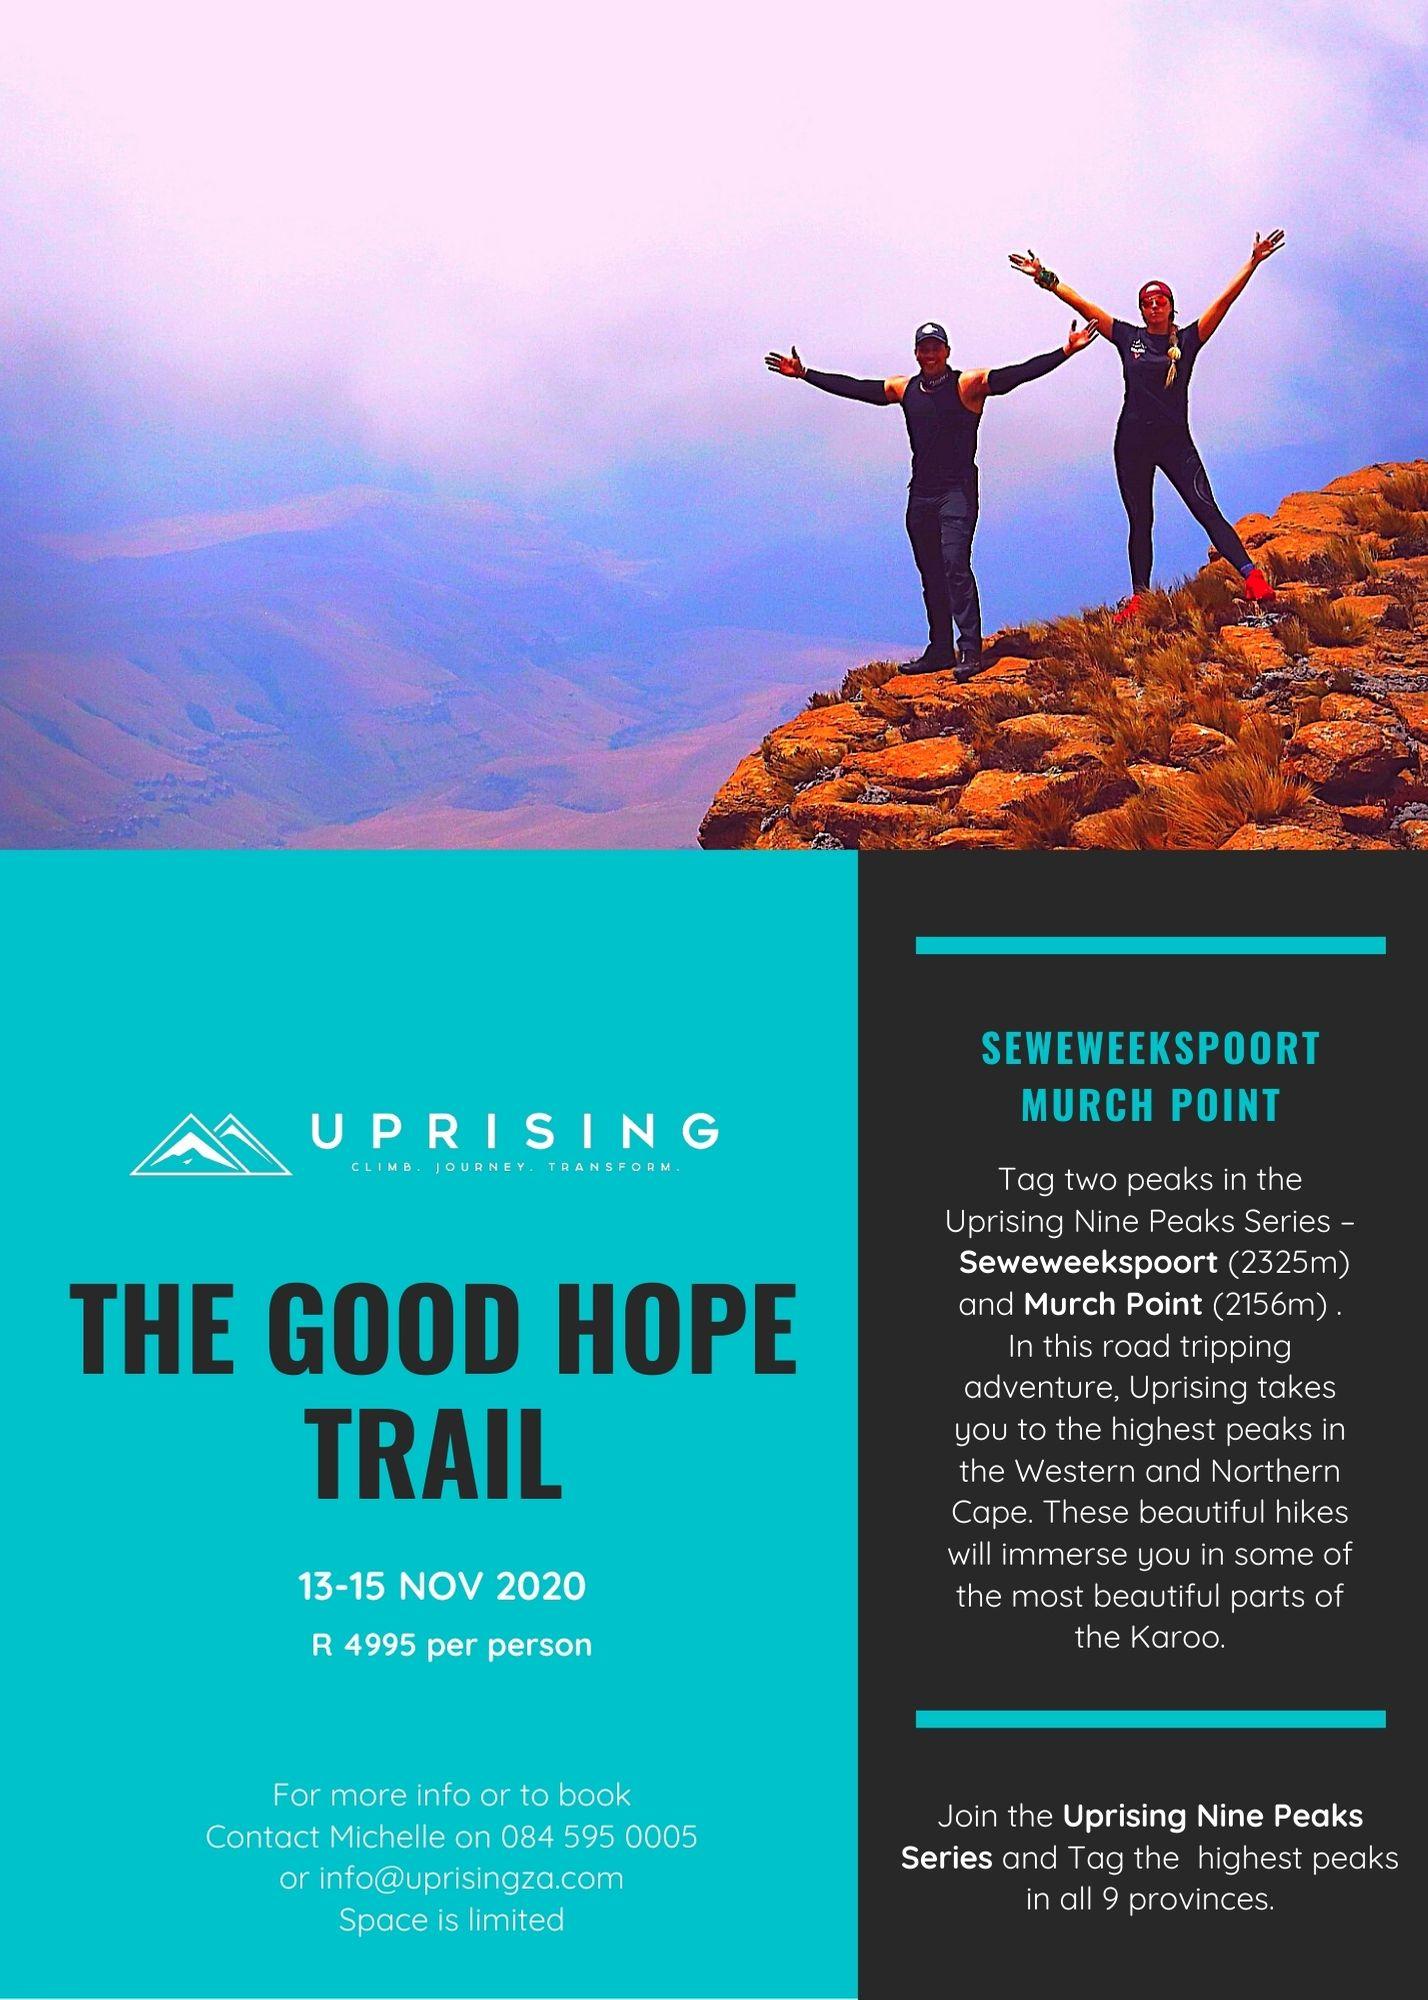 The Good Hope Trail